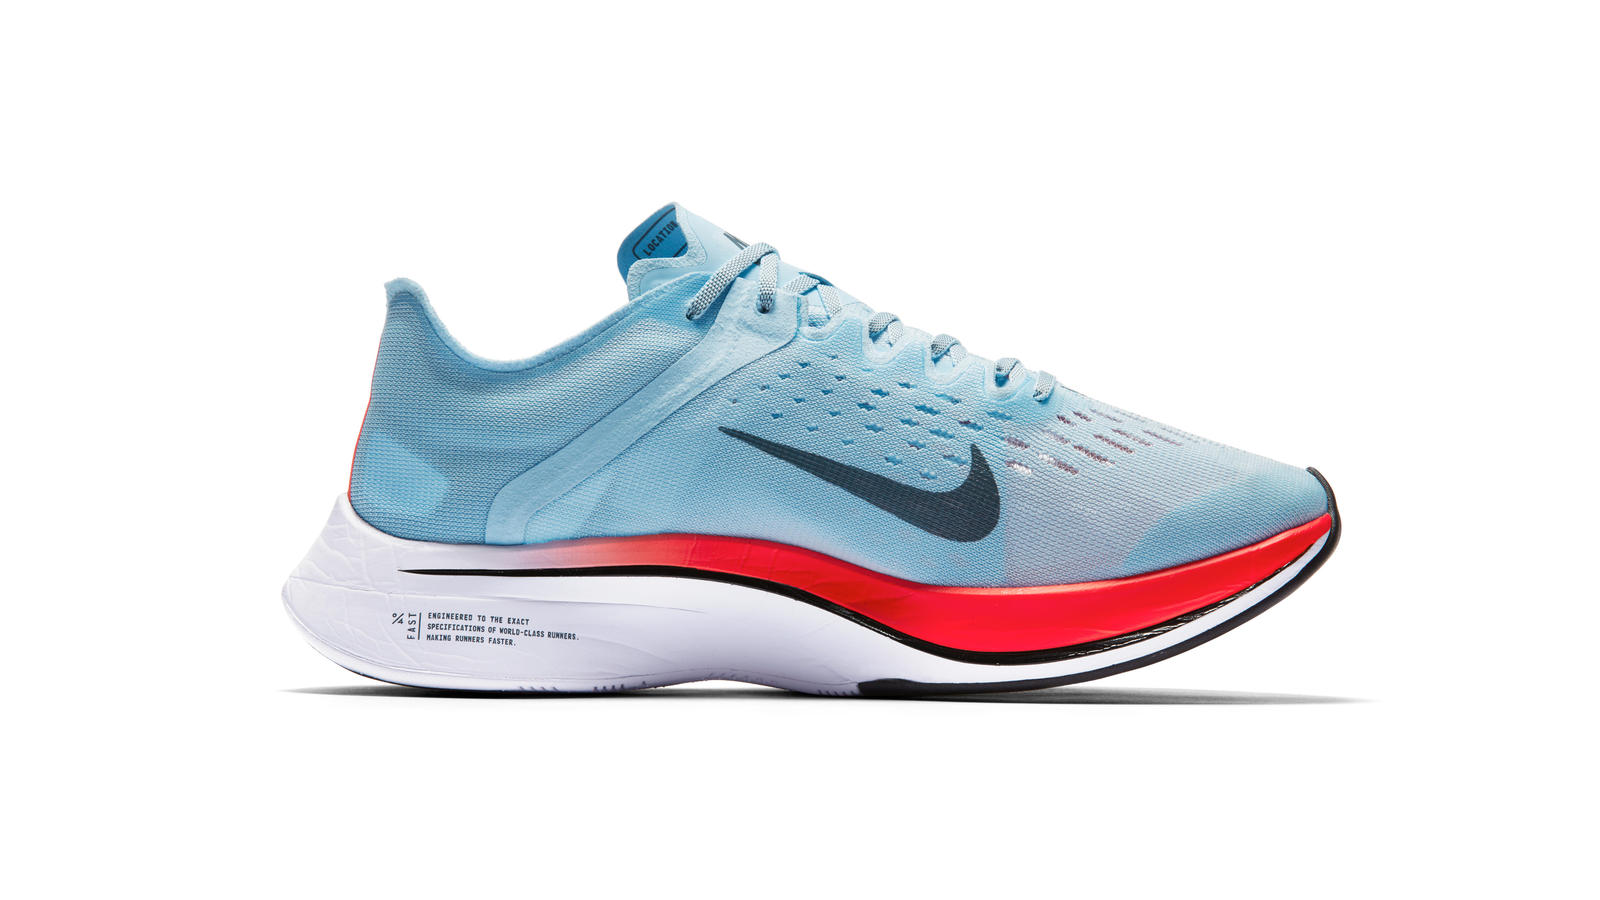 Nike Vapor Flys Shoes